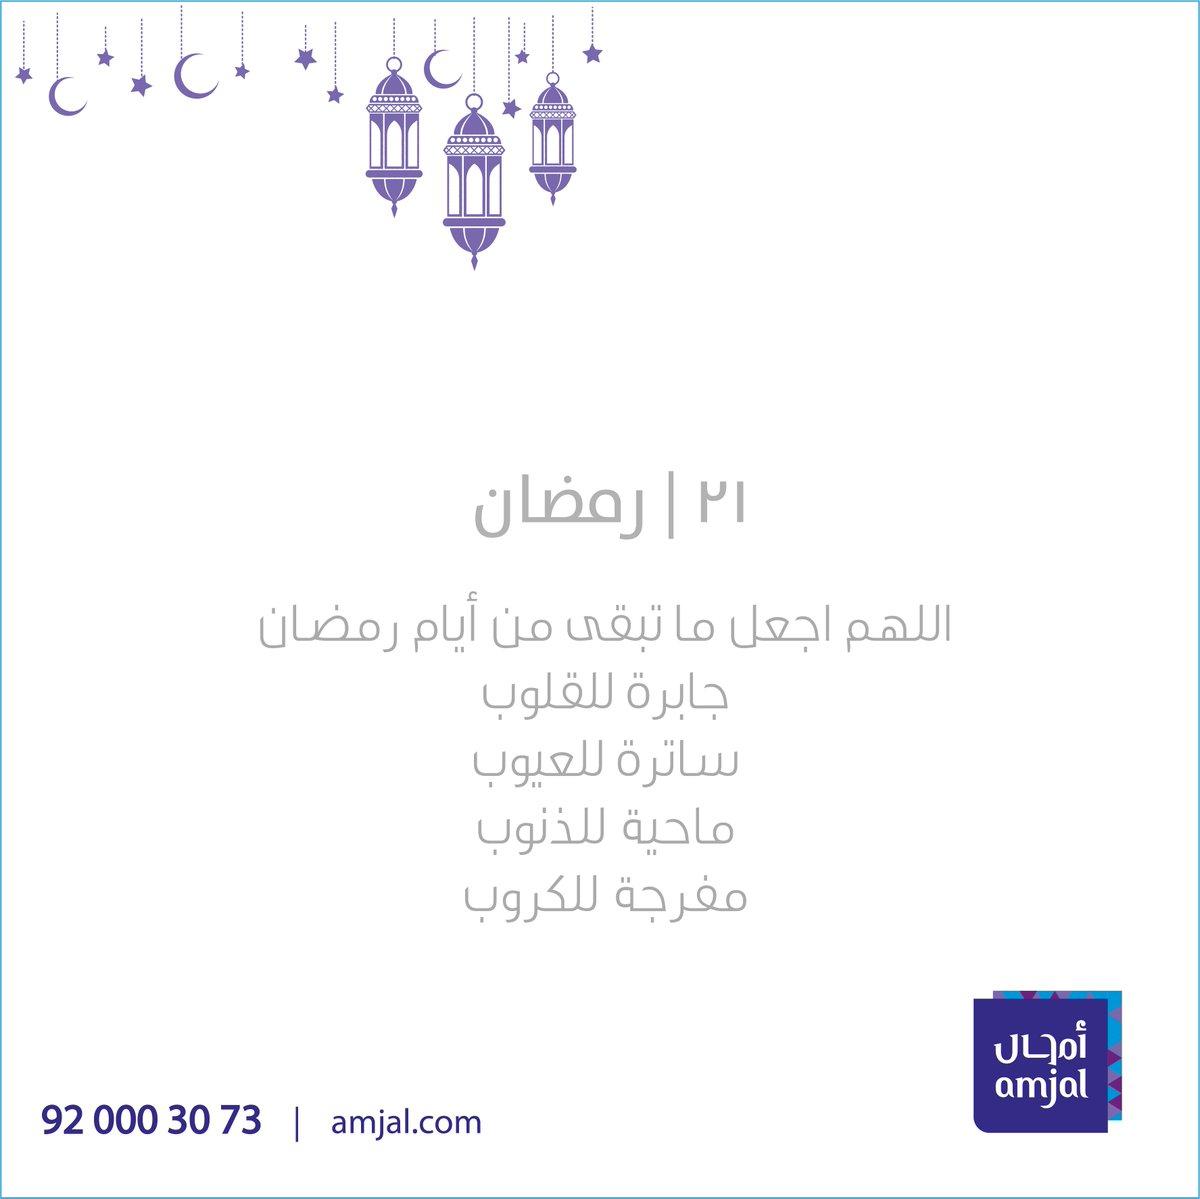 #دعاء_رمضان https://t.co/CrNMdANcCu